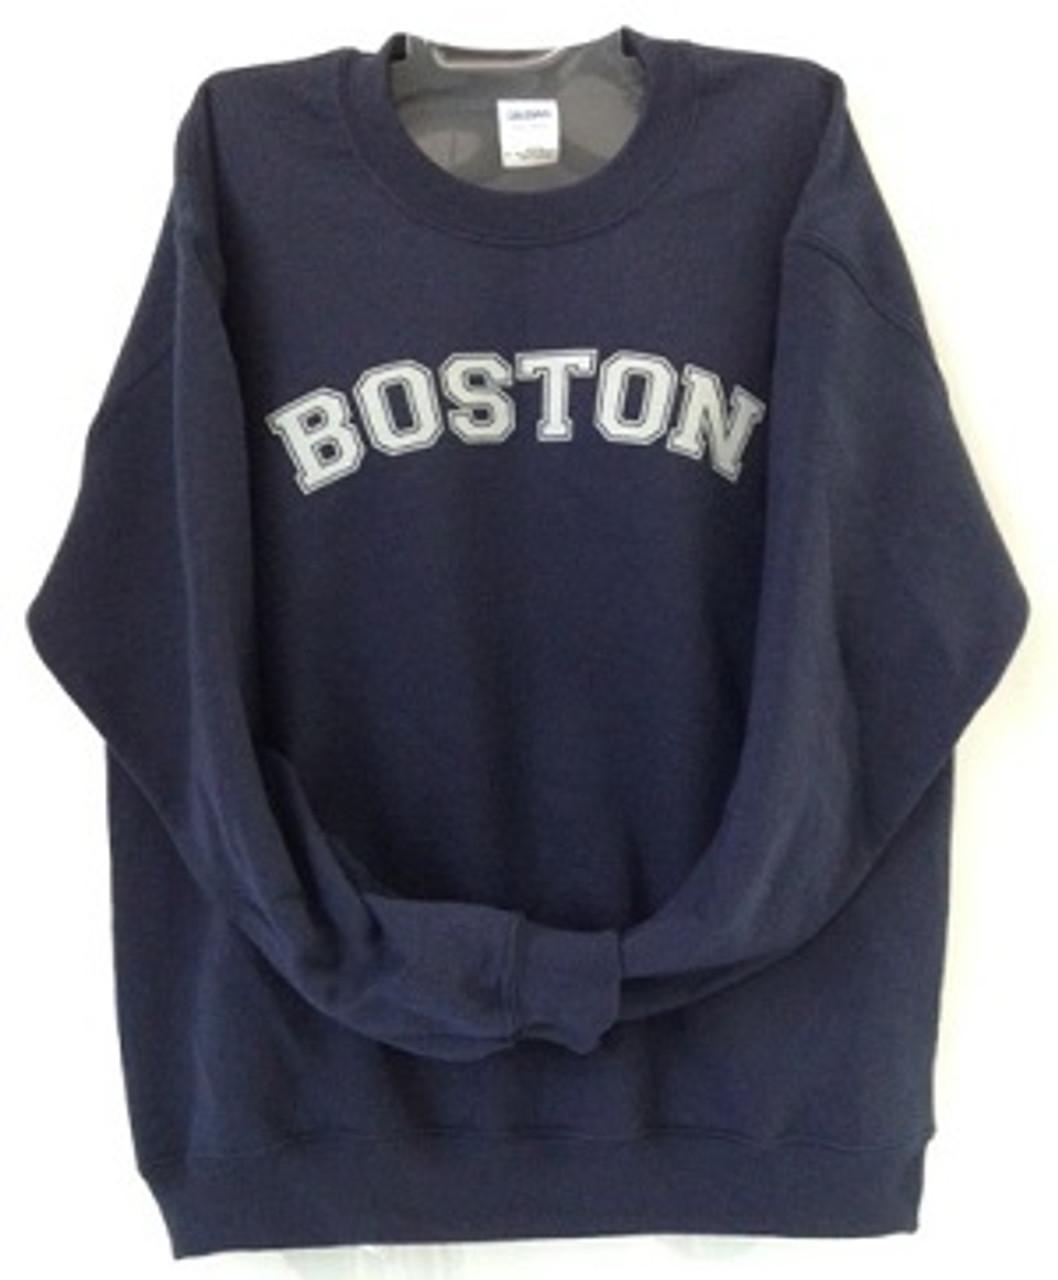 Dalliance Boxers Boston Sweatshirt Maroon with Gray Boston Imprint